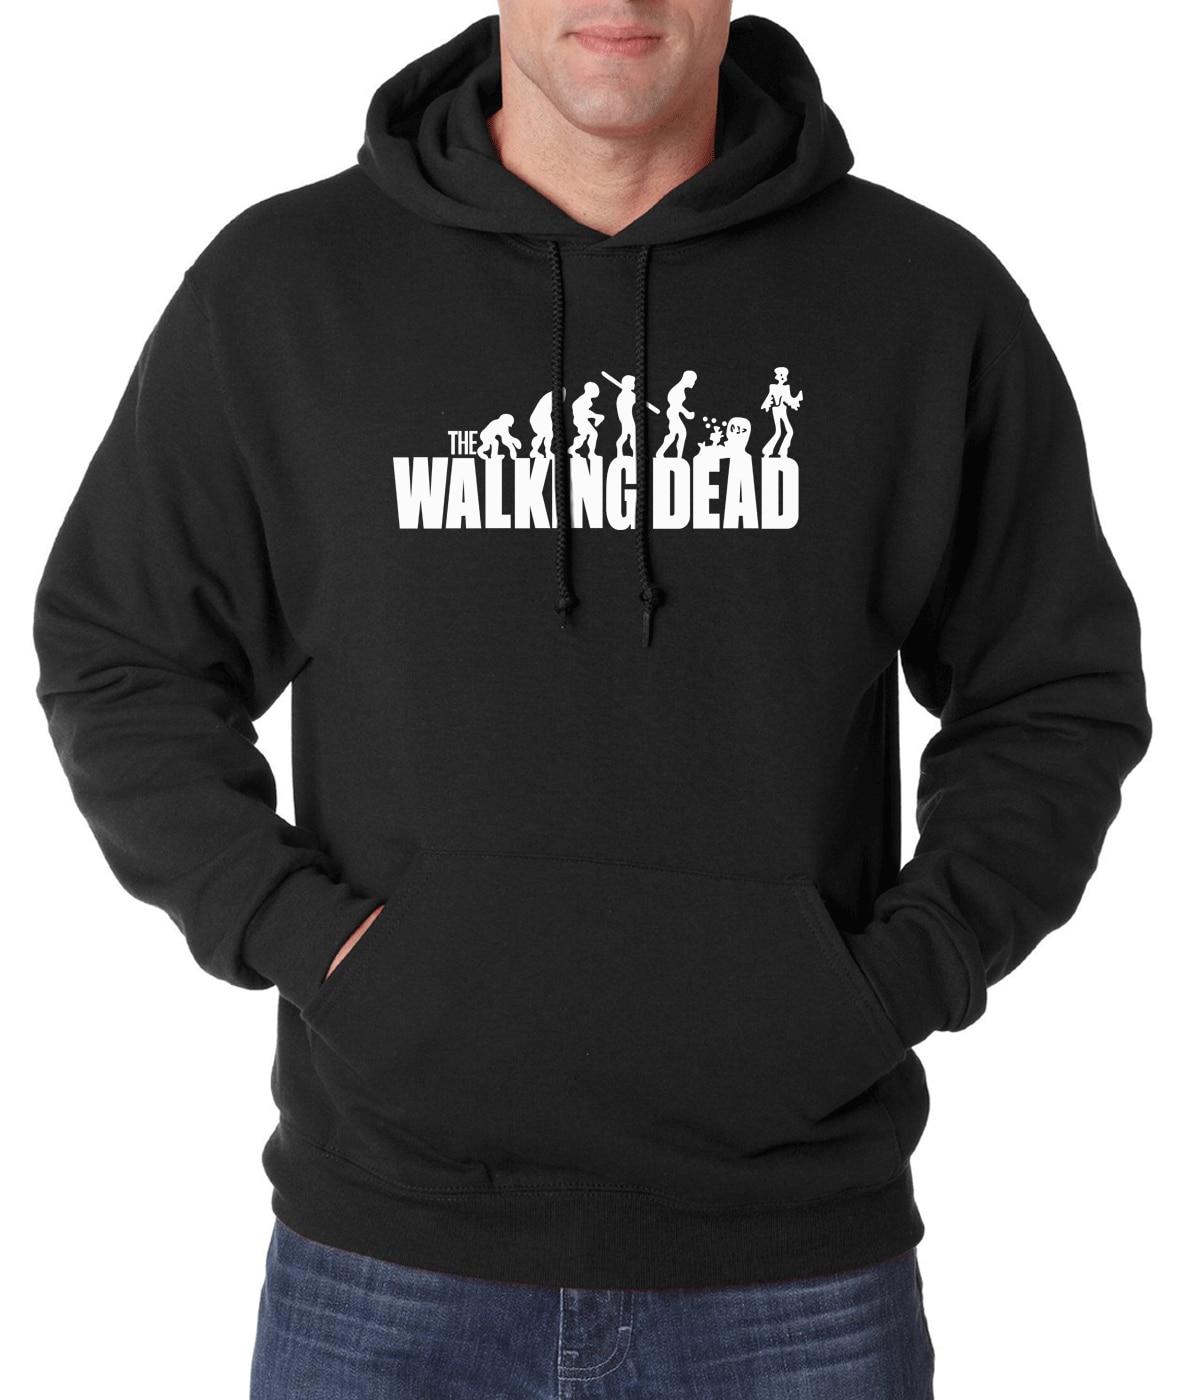 Hot Sale The Walking Dead men hoodies 2019 new spring winter sweatshirt fleece high quality hoodie hip hop streetwear for fans